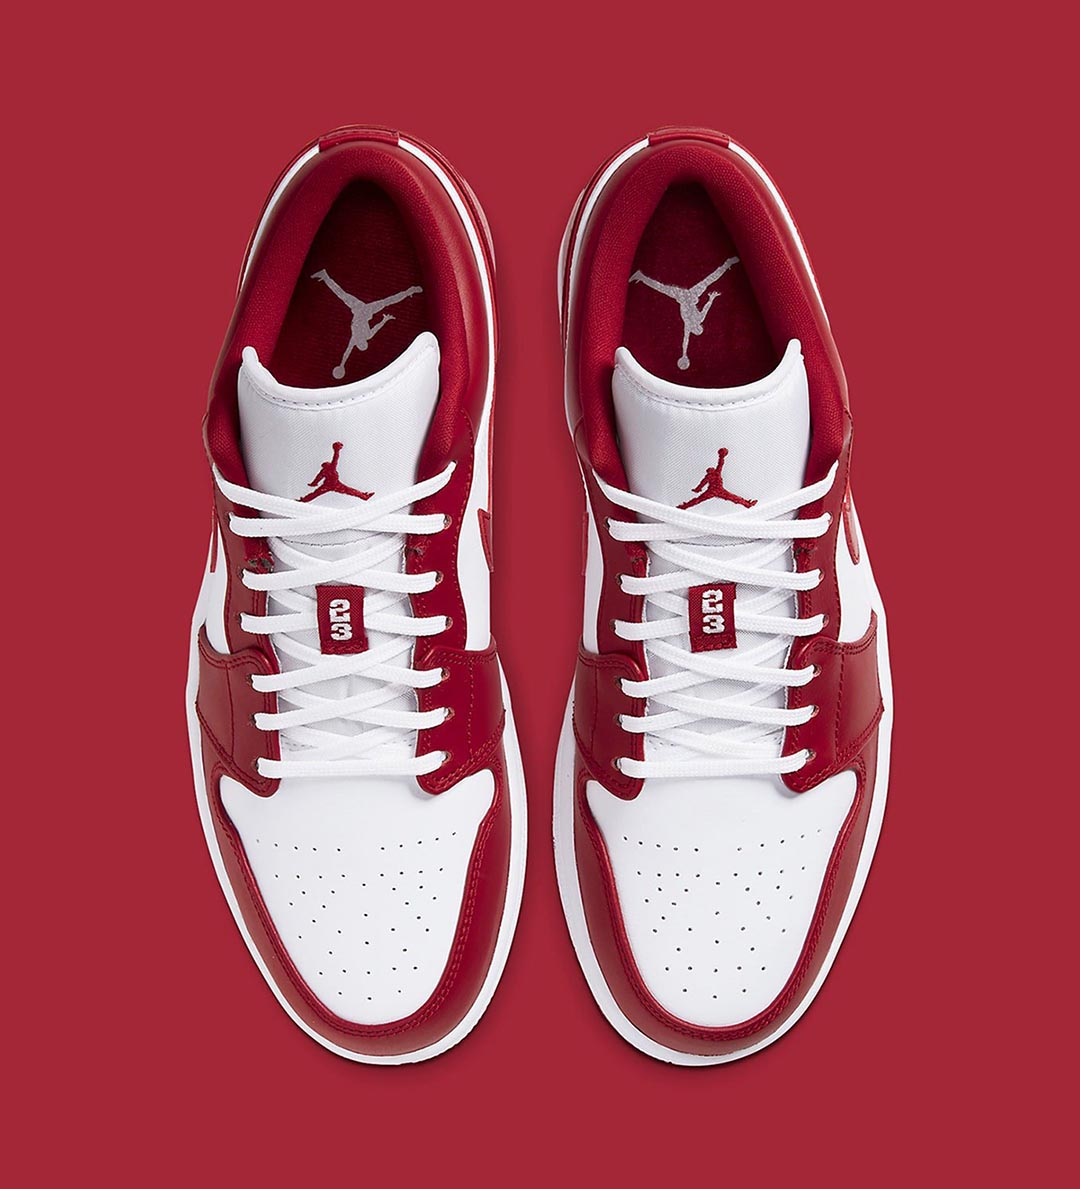 air-jordan-1-retro-low-new-beginnings-gym-red-553558-611-release-date-03